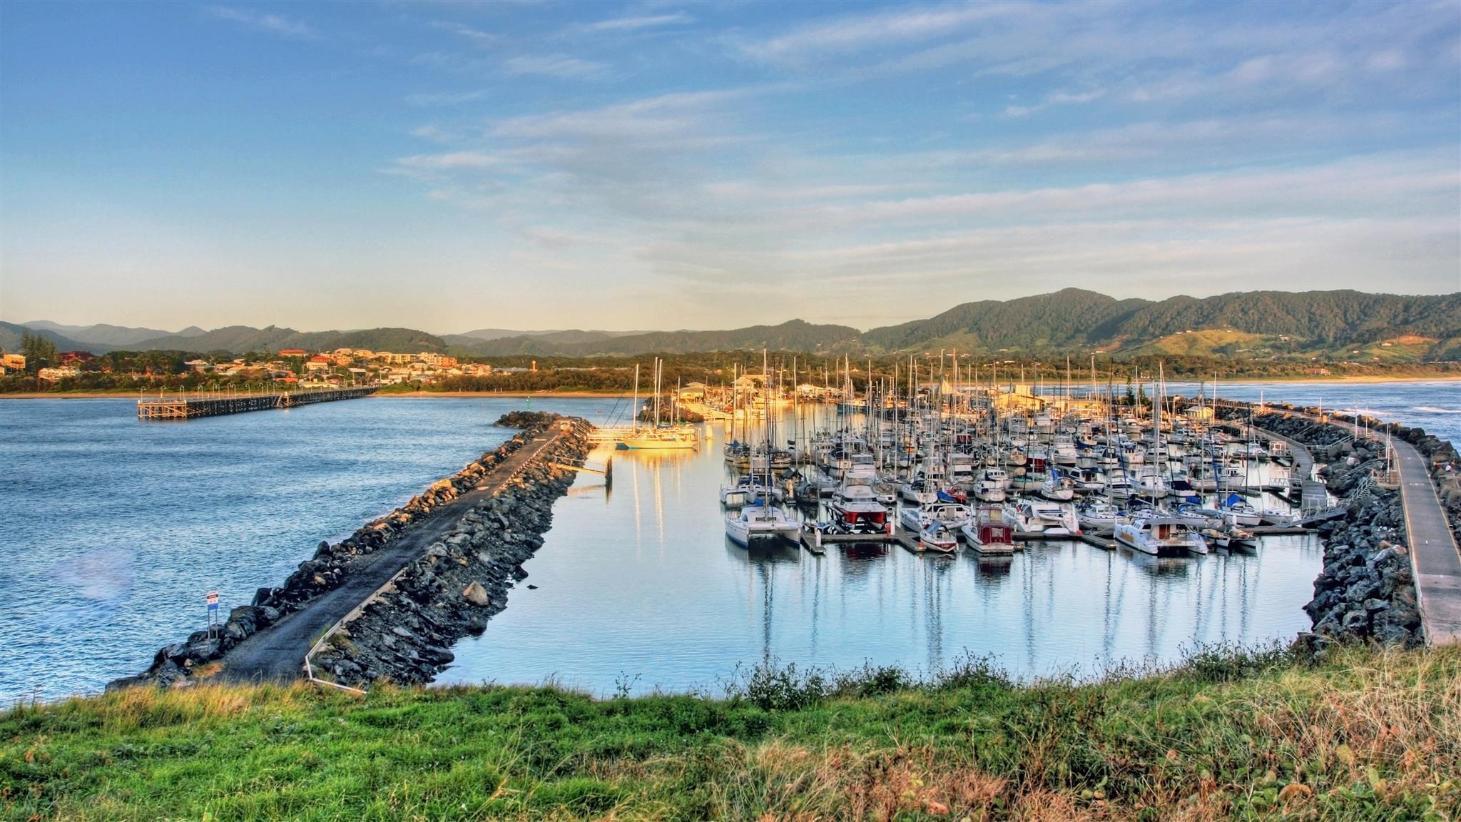 coffs harbour - photo #22